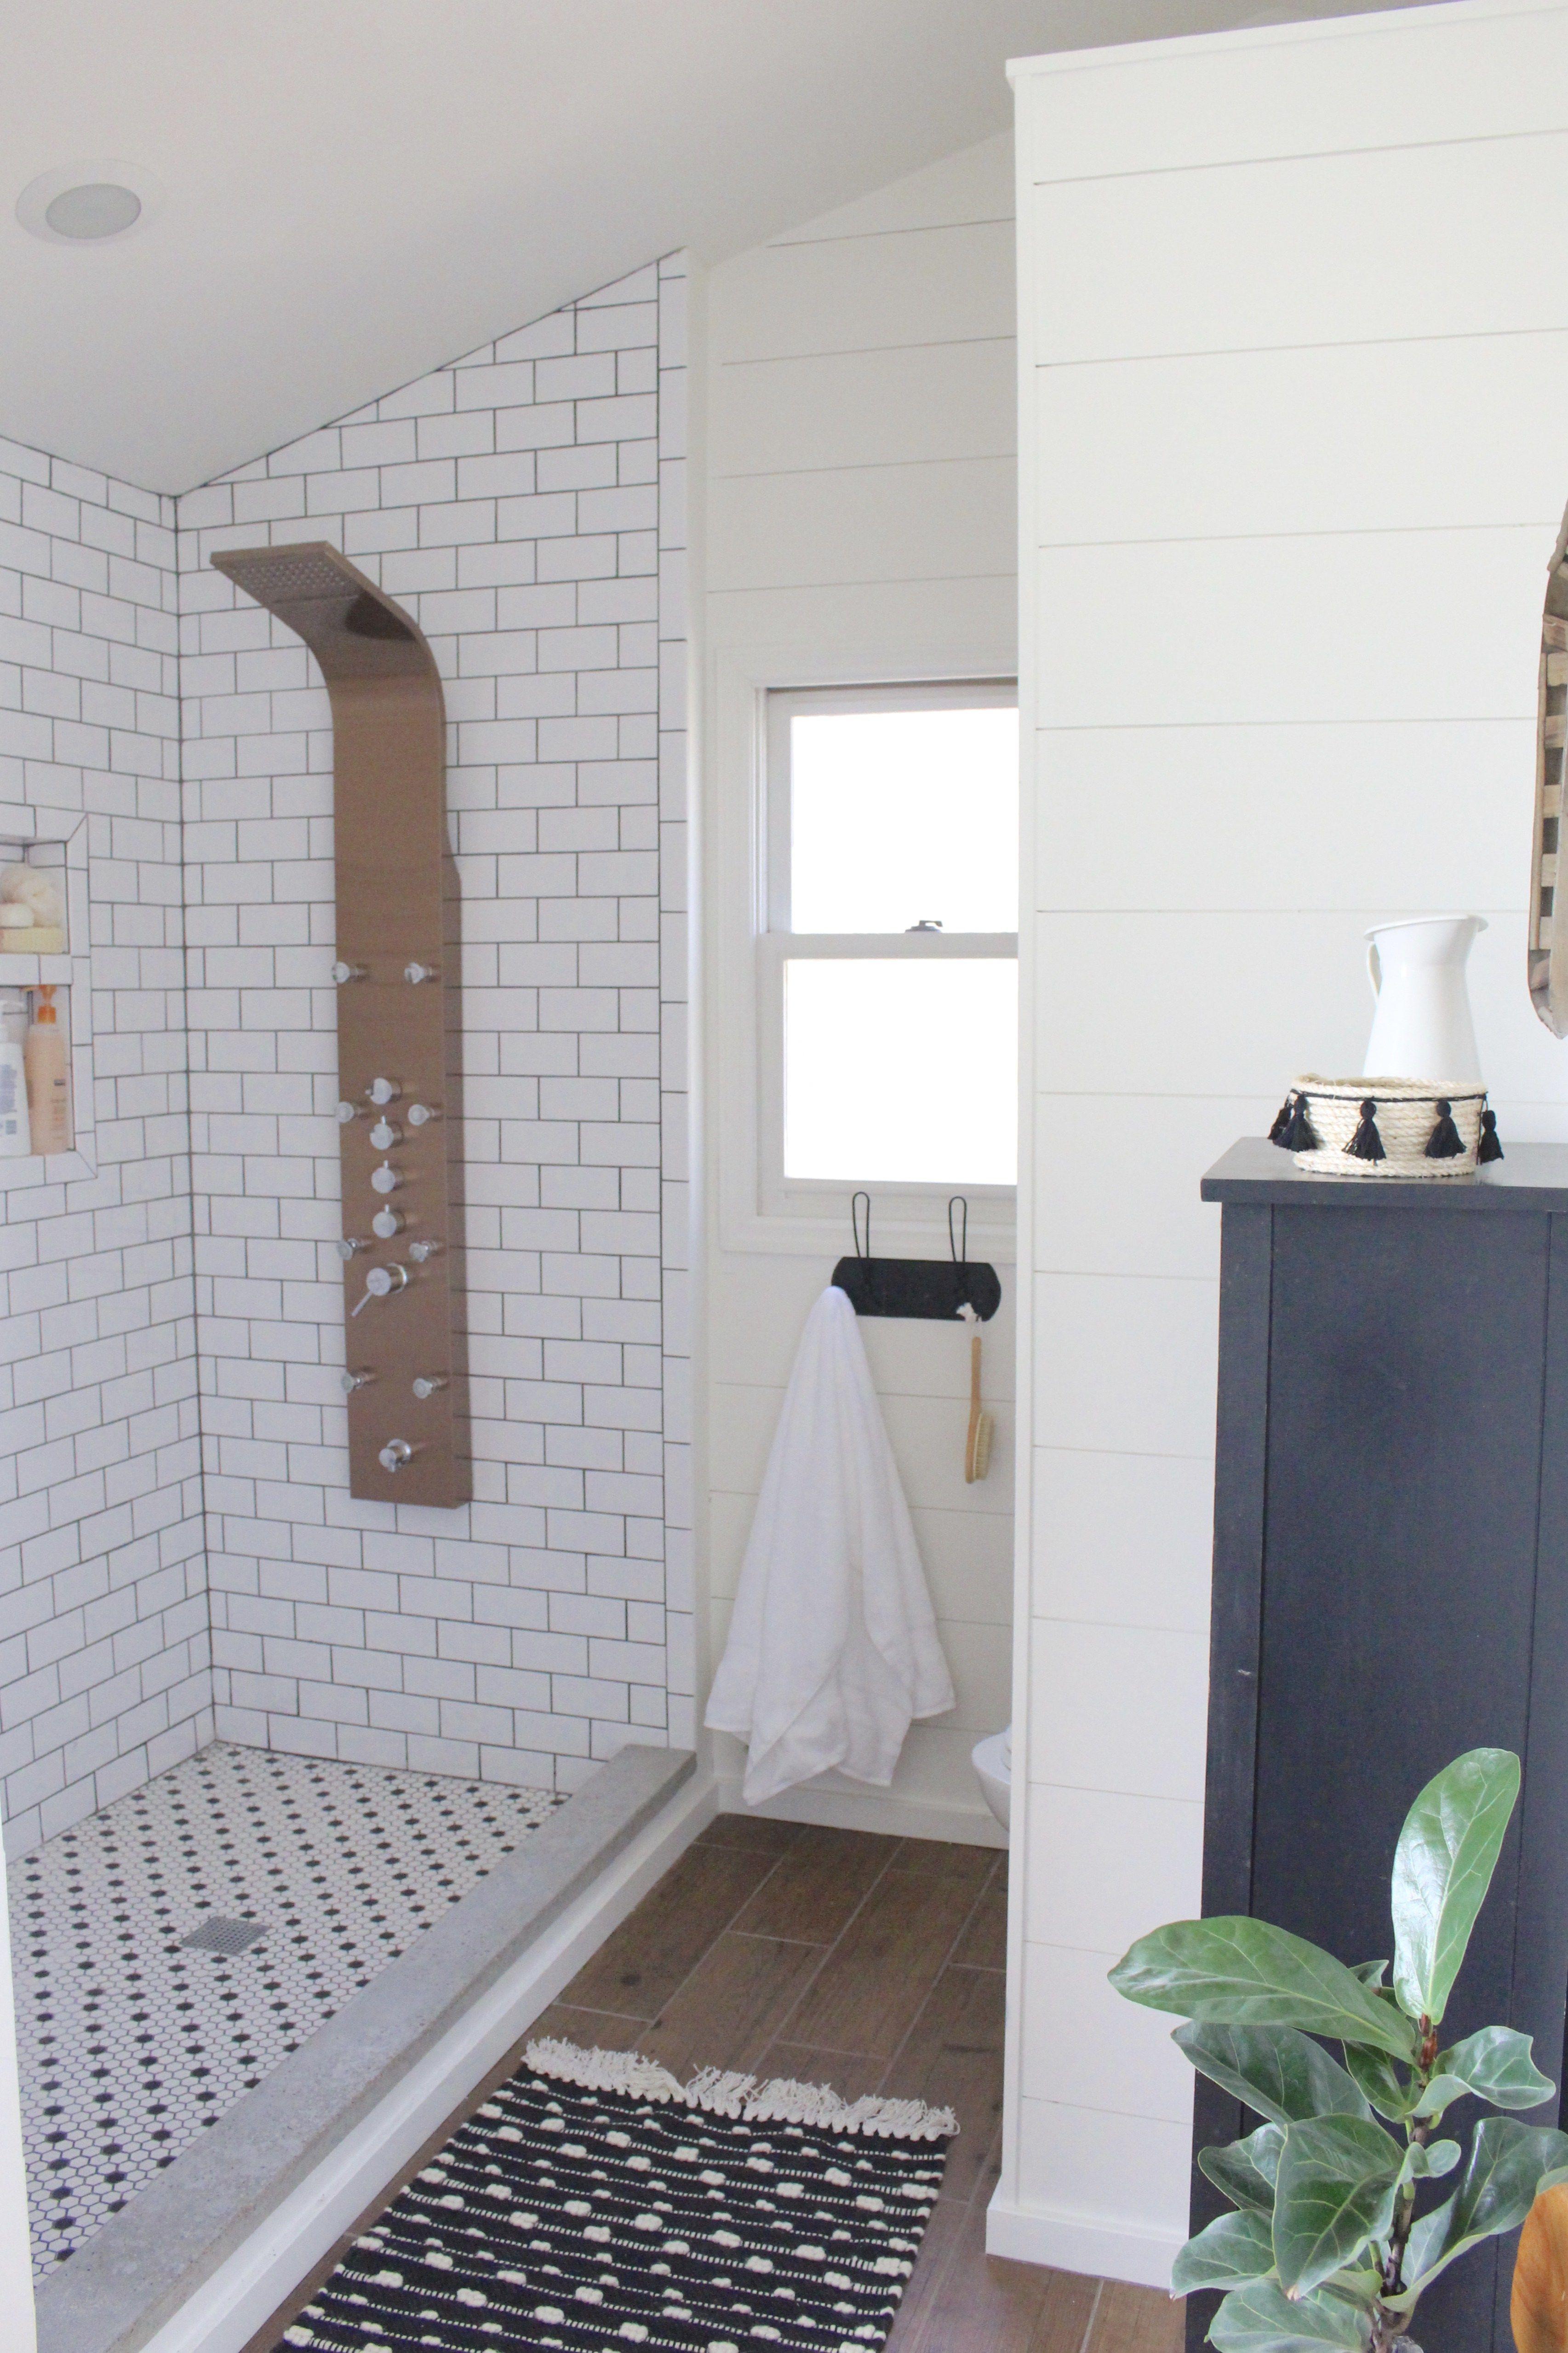 Master Bathroom Renovation- How to achieve a farmhouse style ...